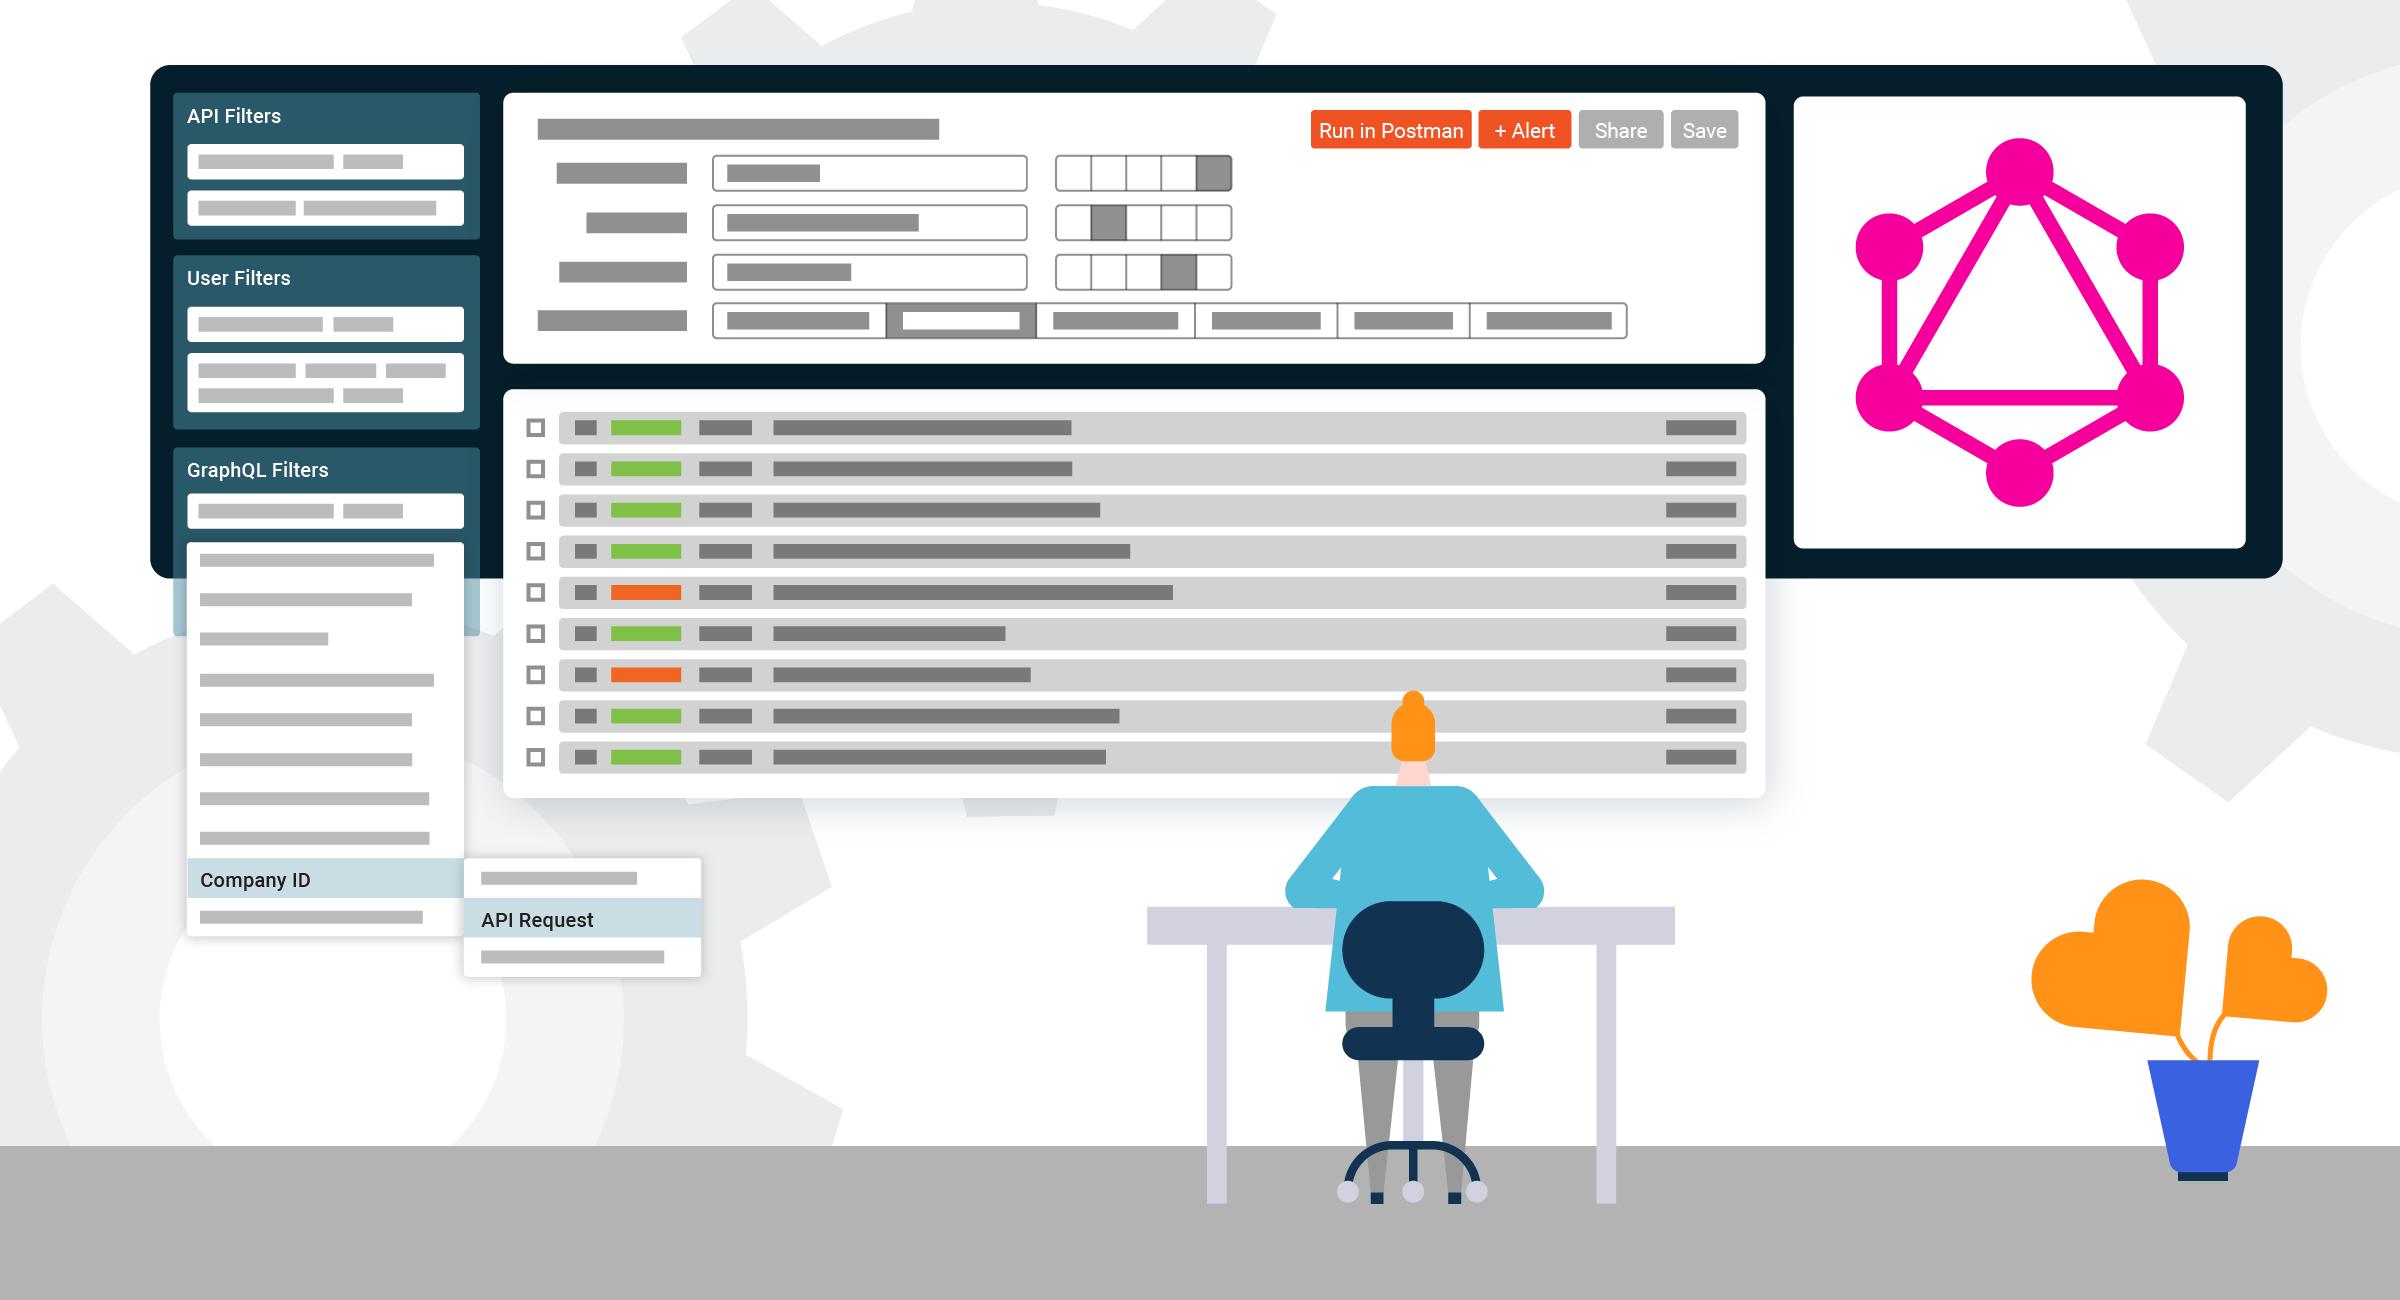 How to Best Monitor GraphQL APIs